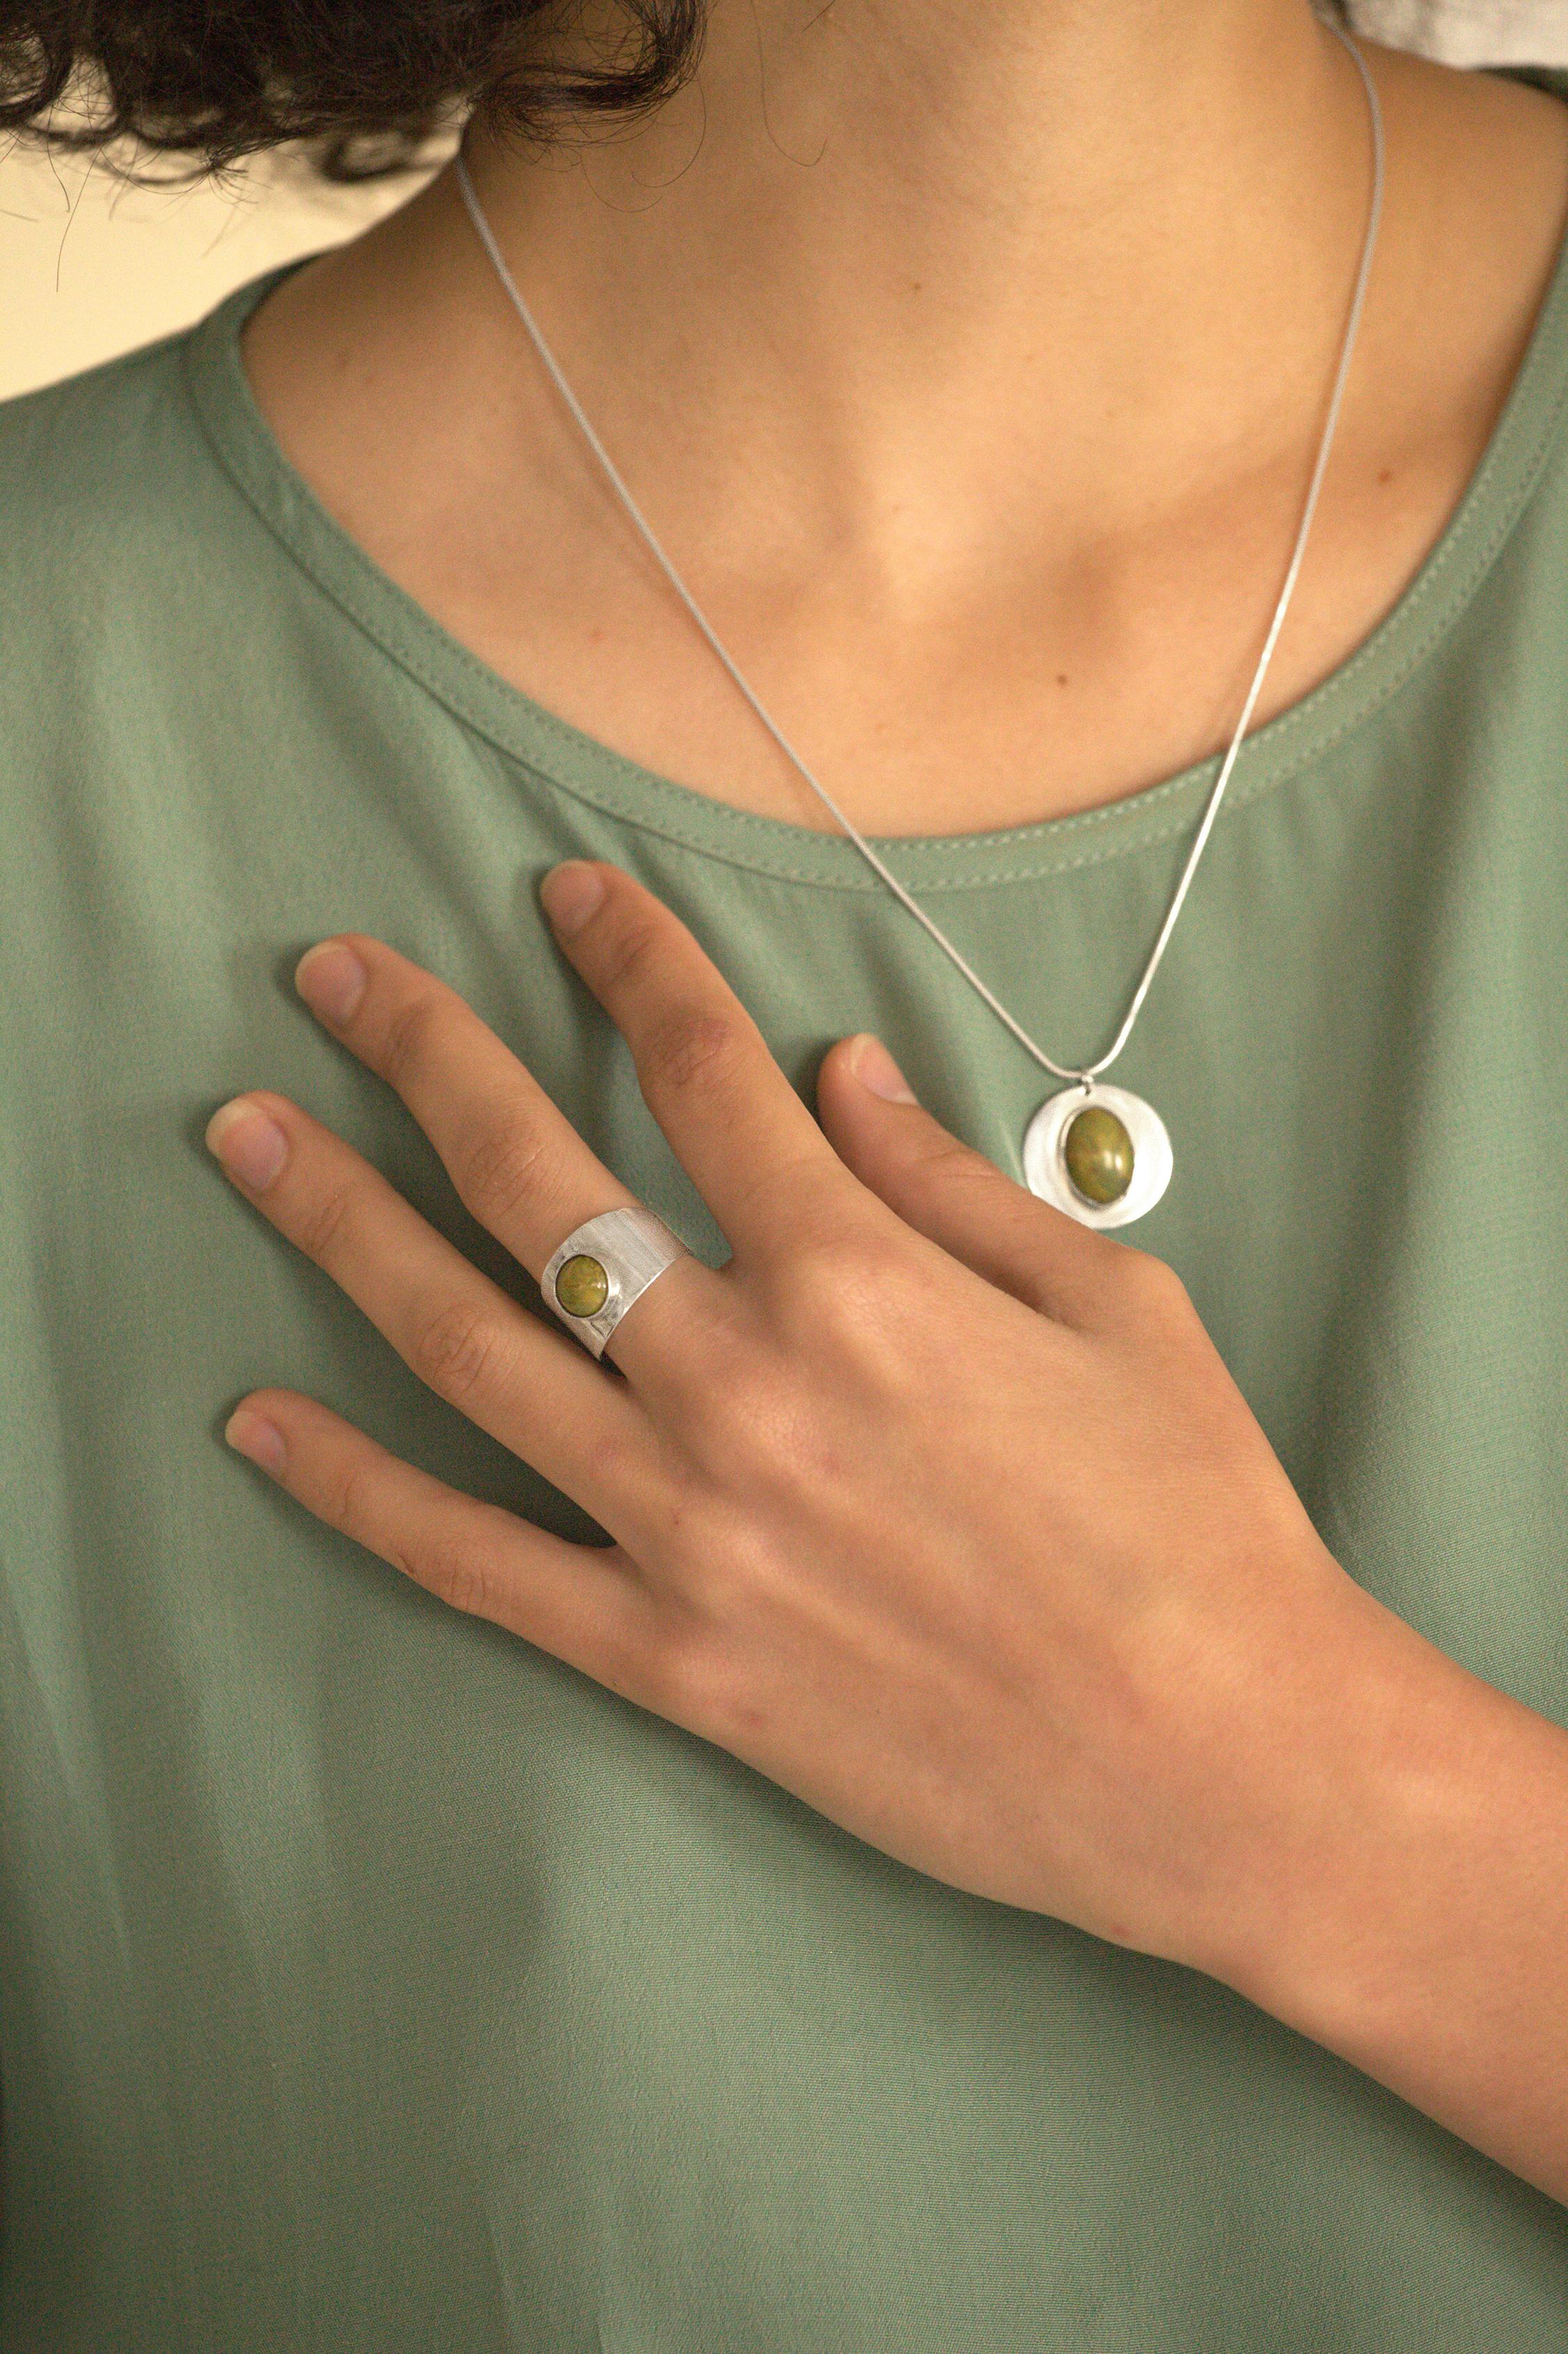 Anillo y collar PETRA / PETRA ring and necklace